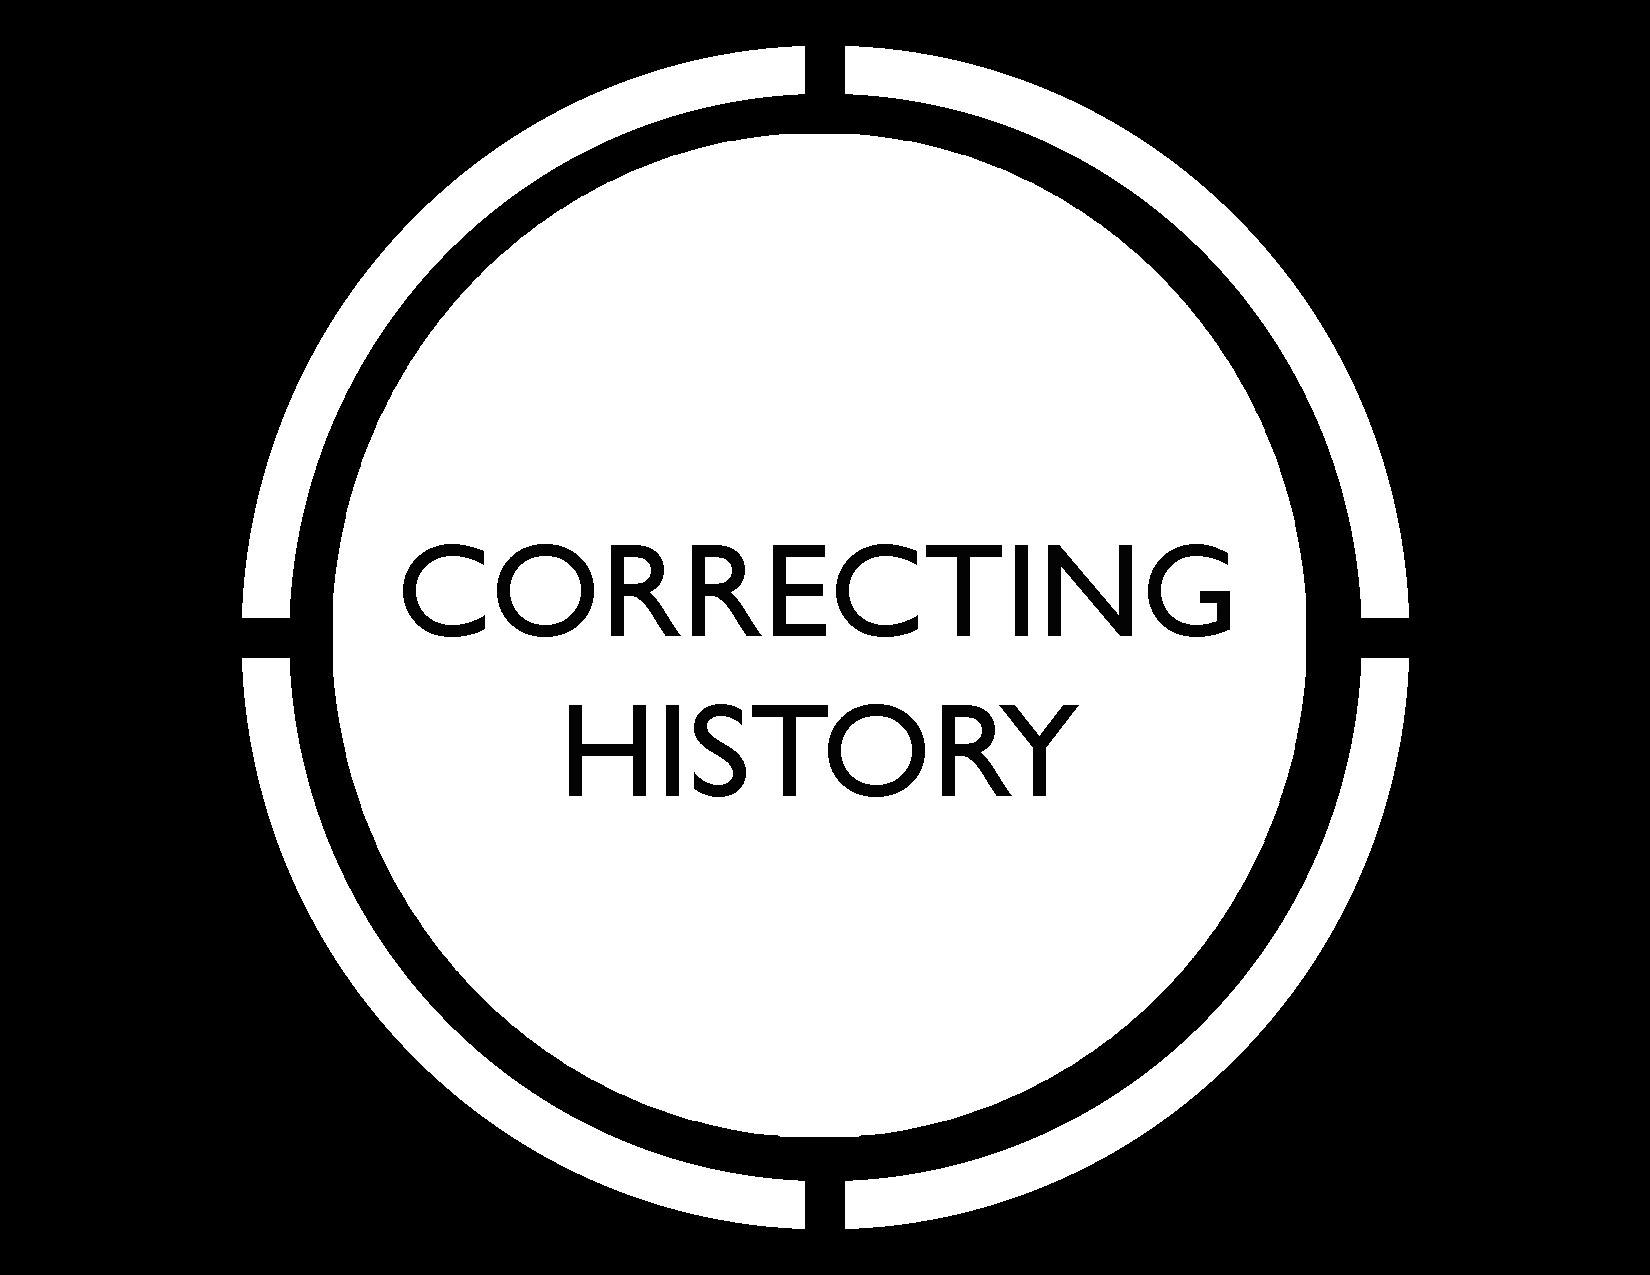 CORRECTING HISTORY2.jpg